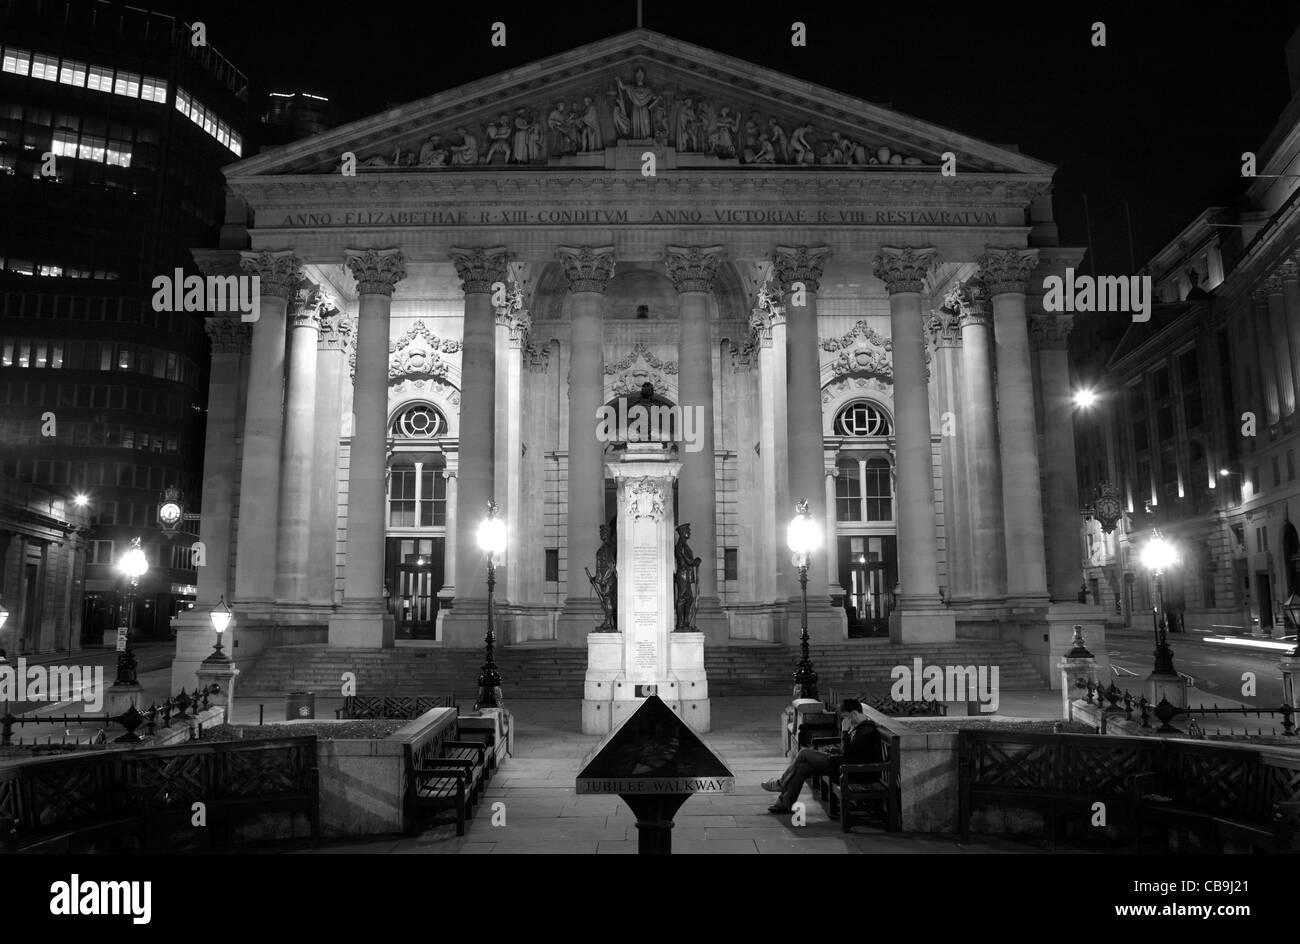 London - Exchange building - Stock Image